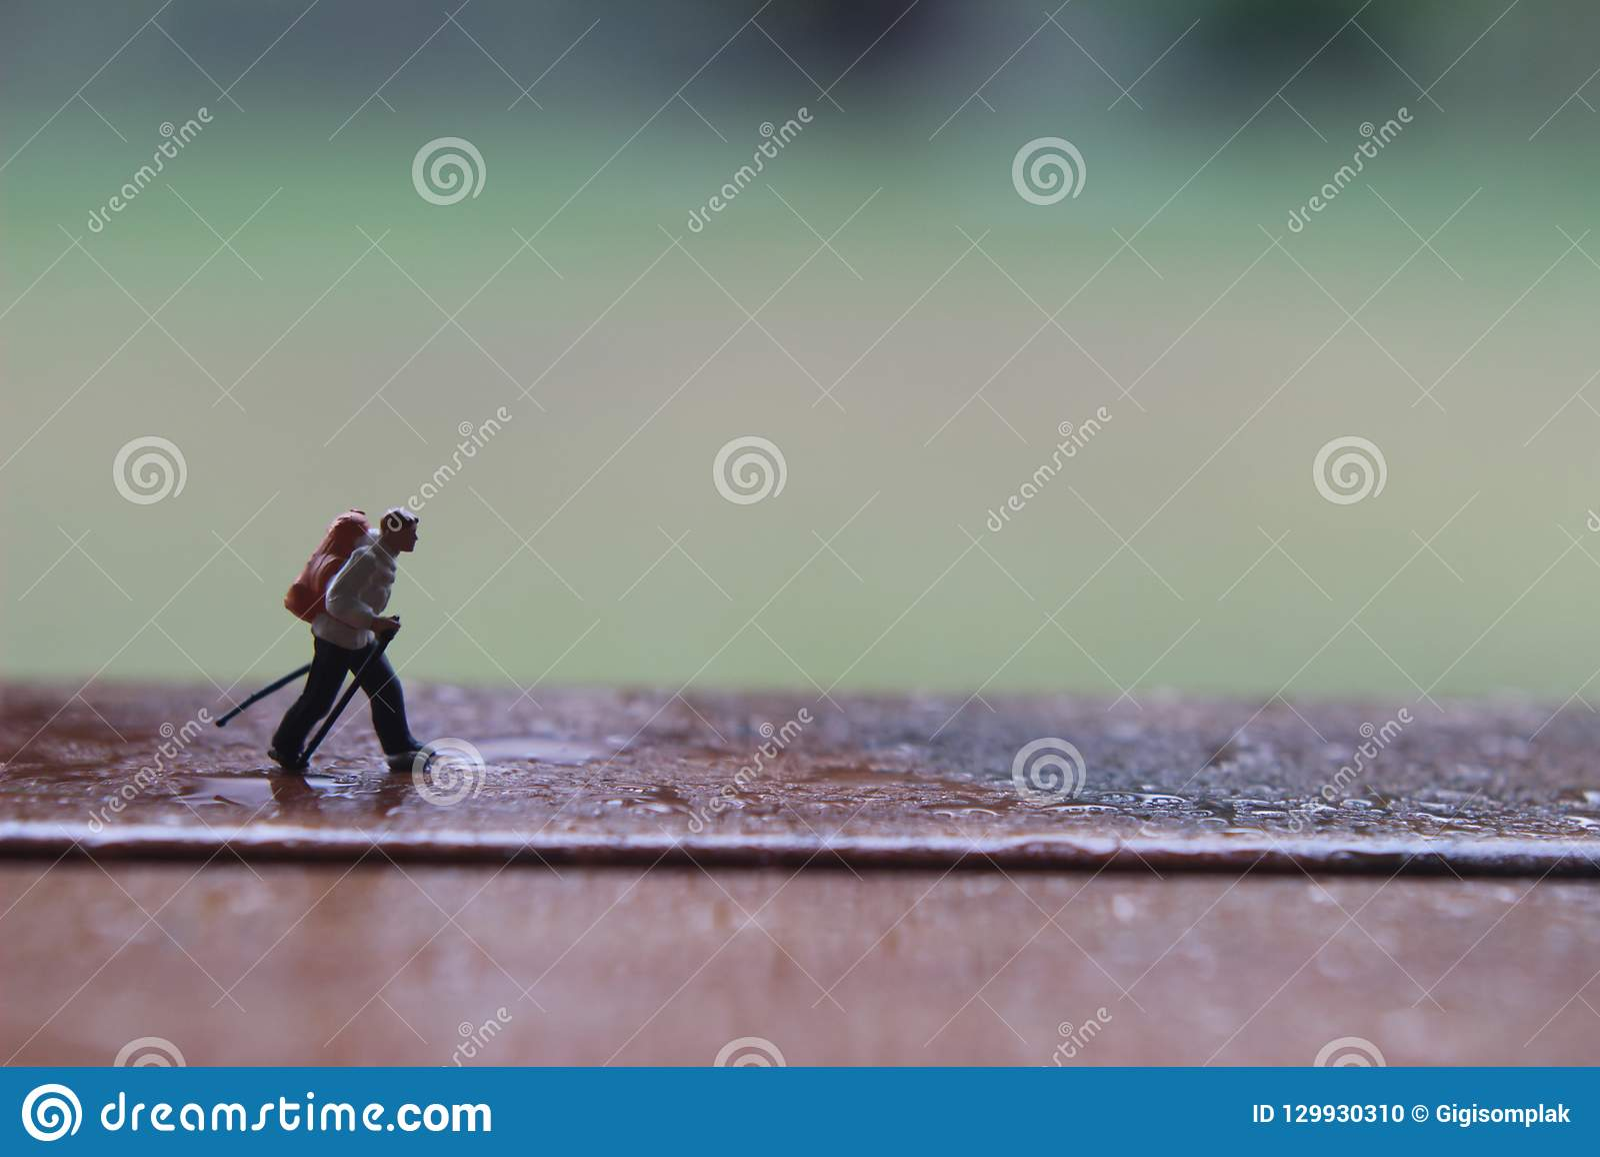 Mini Figure Hiker, caminando en la trayectoria de madera mojada